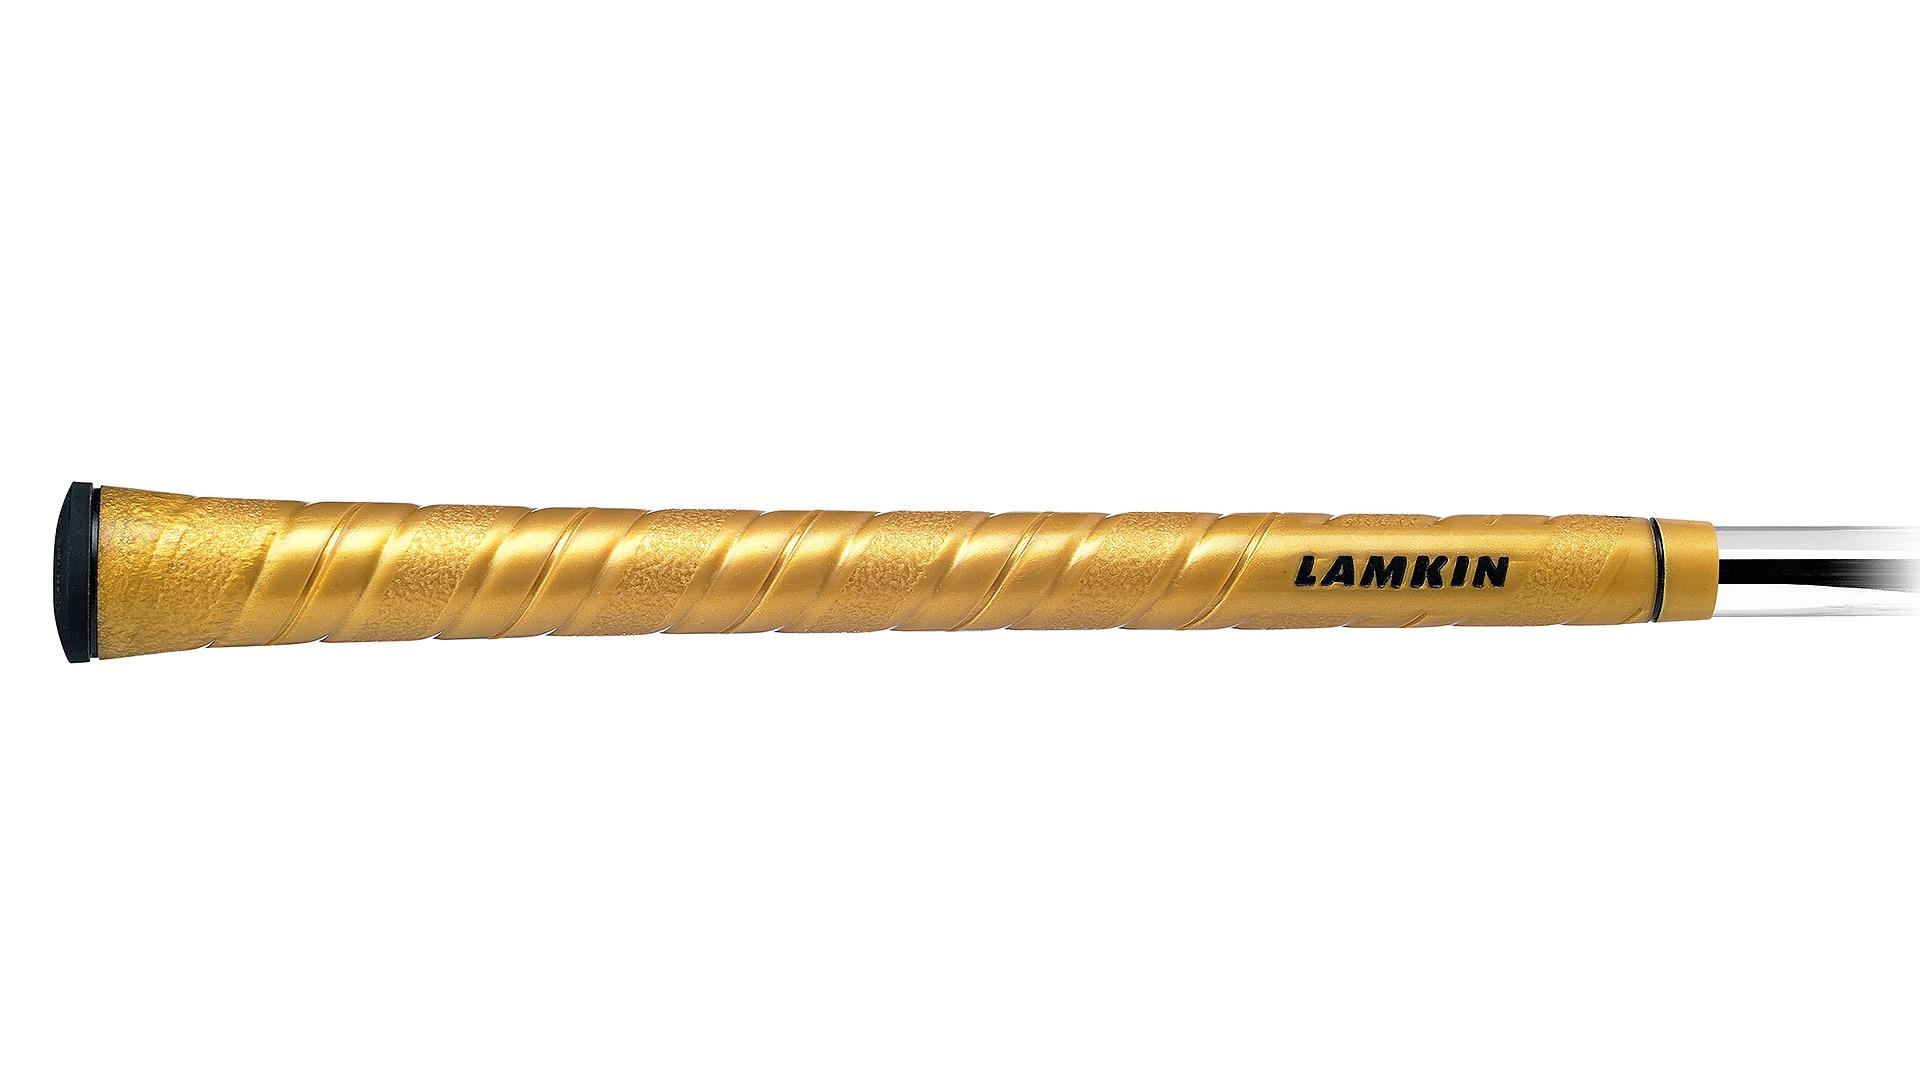 Olympic spirit lamkin offers gold medal grip golf channel